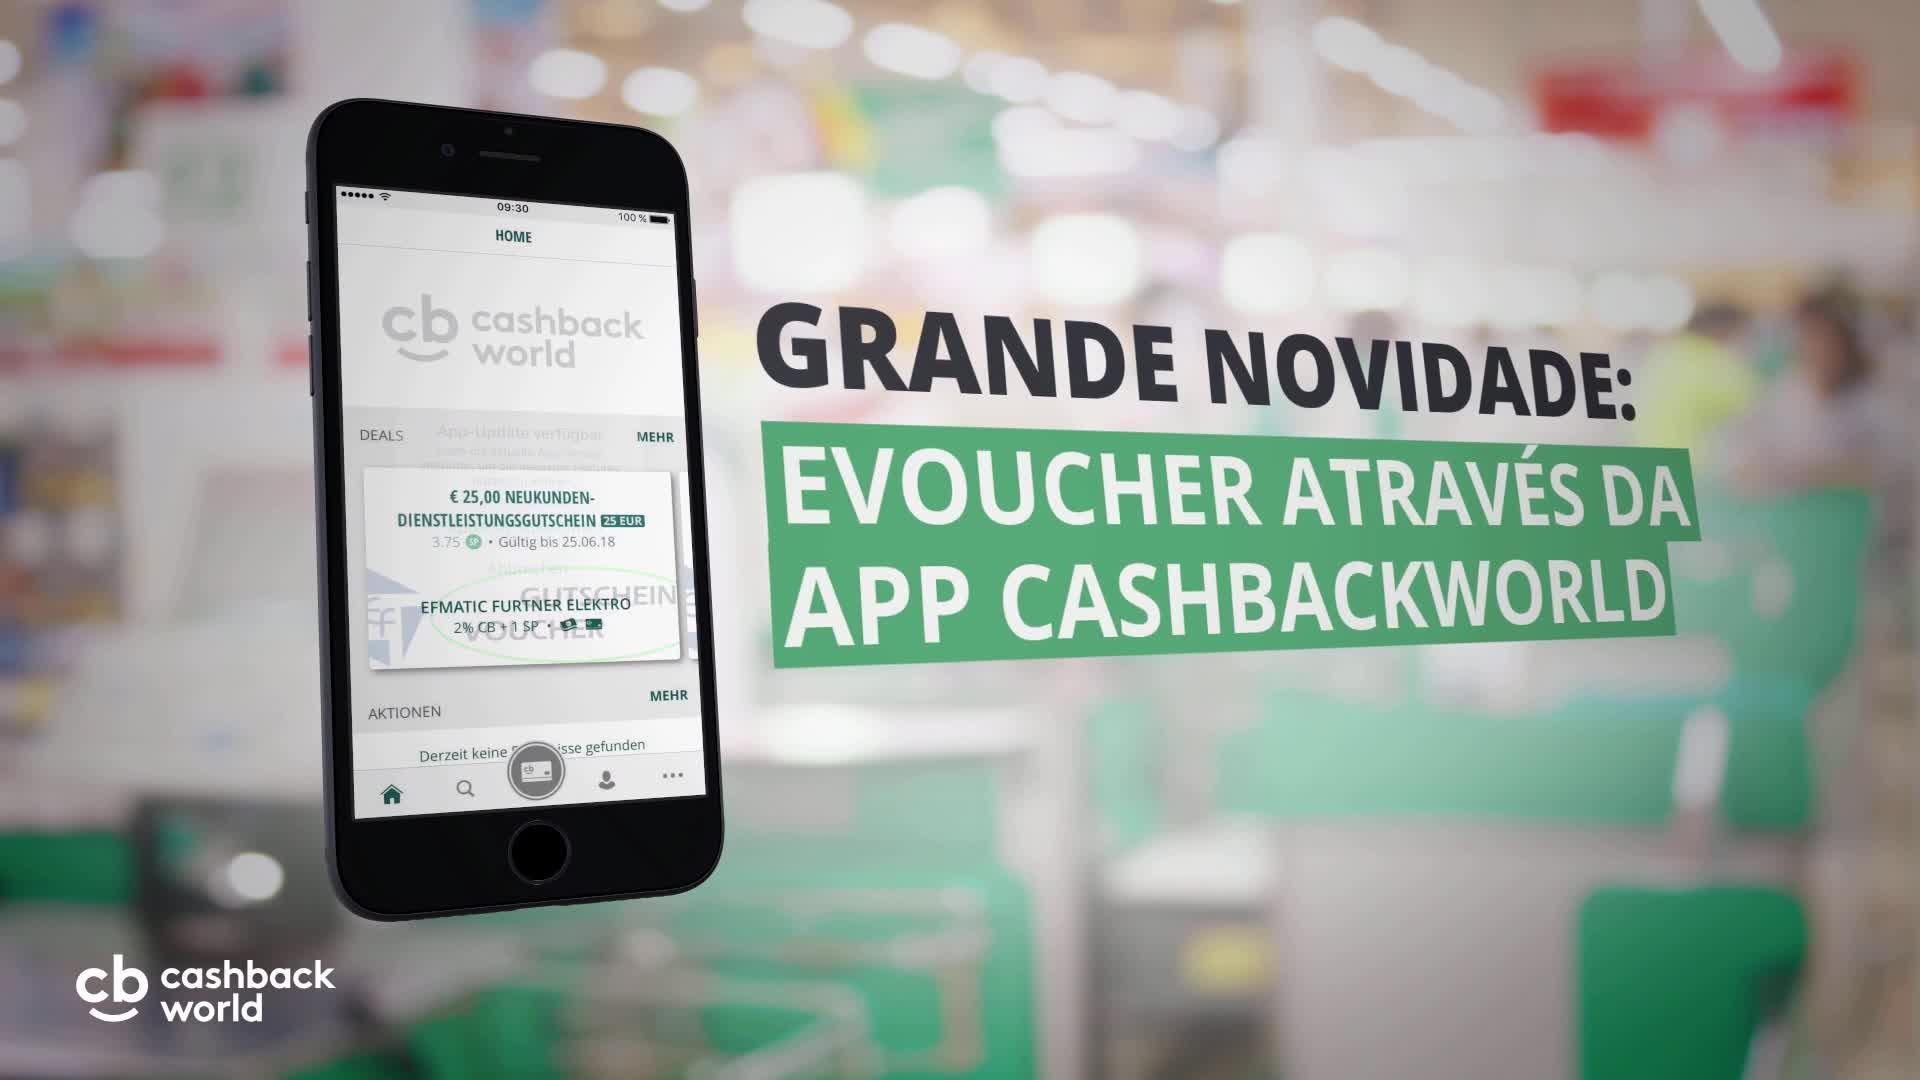 The new Cashback World App